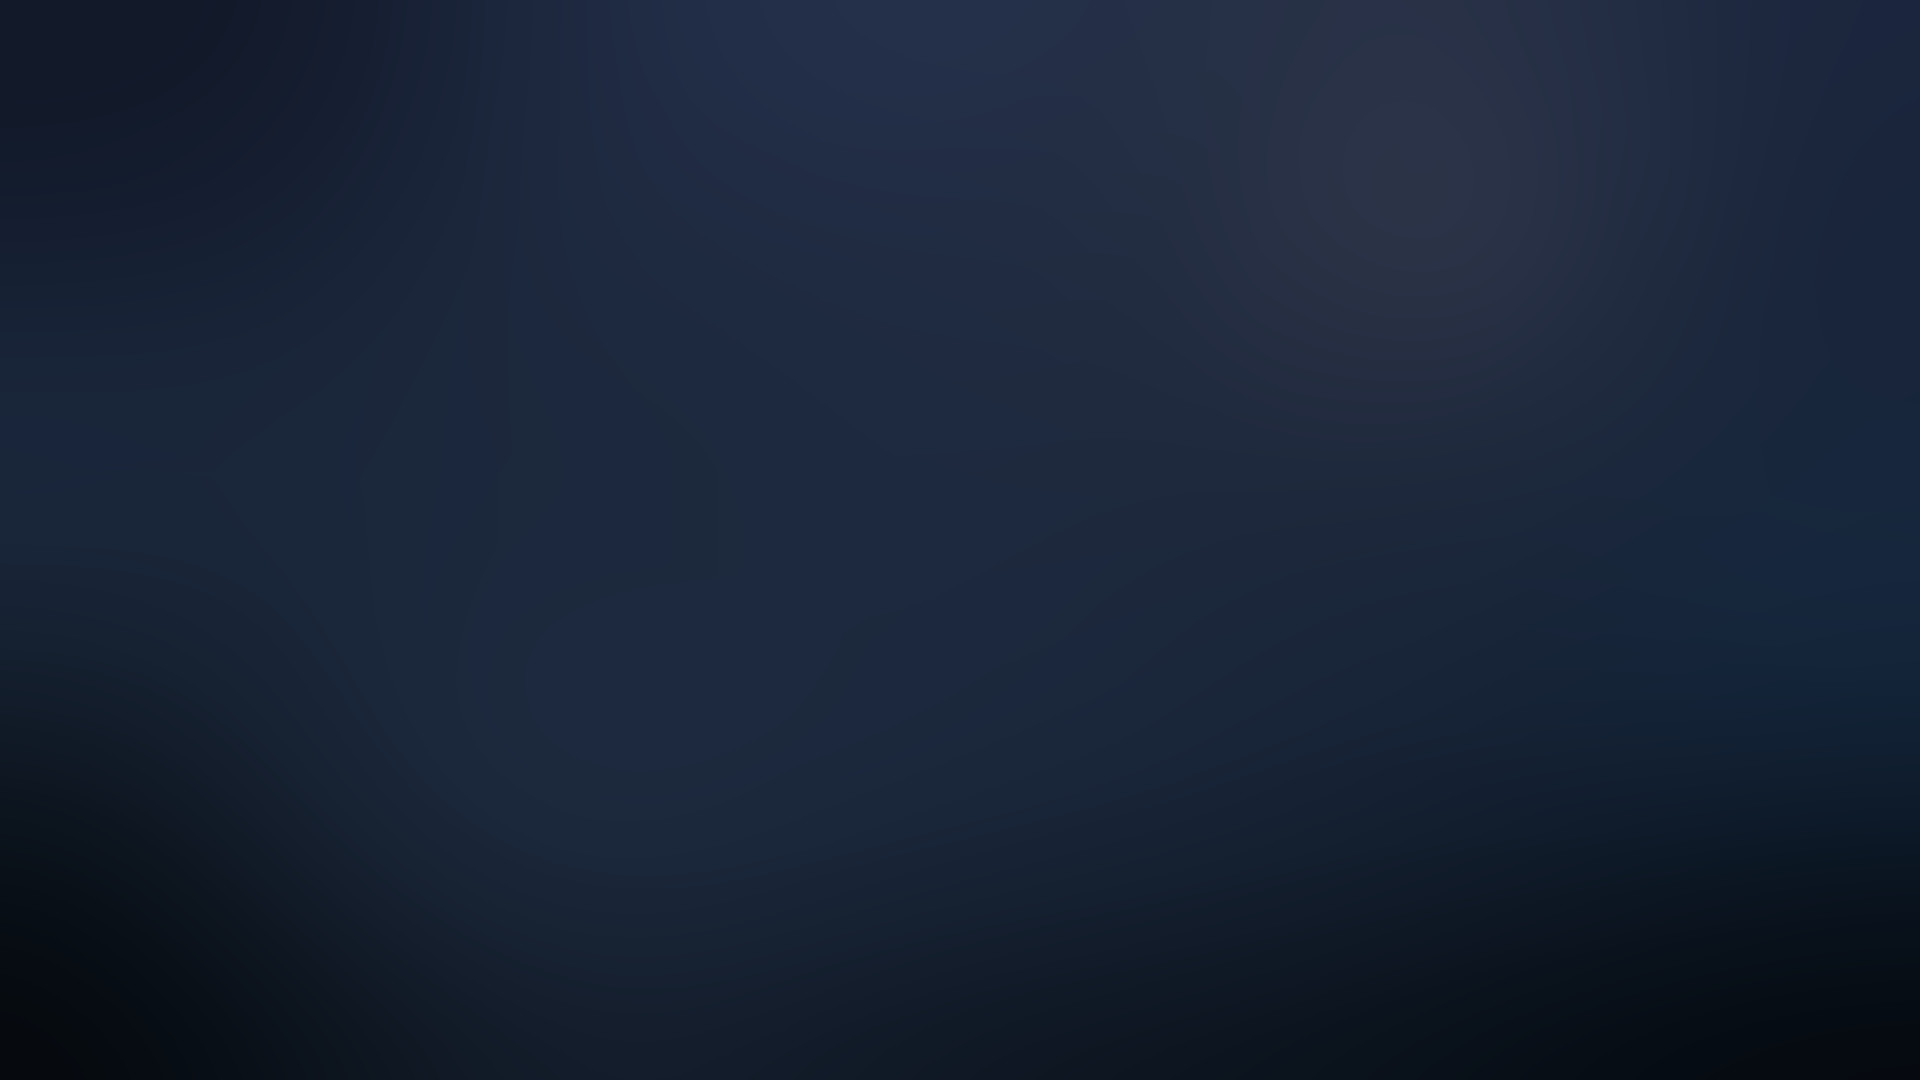 Blue Gradient Wallpaper Blue, Gradient